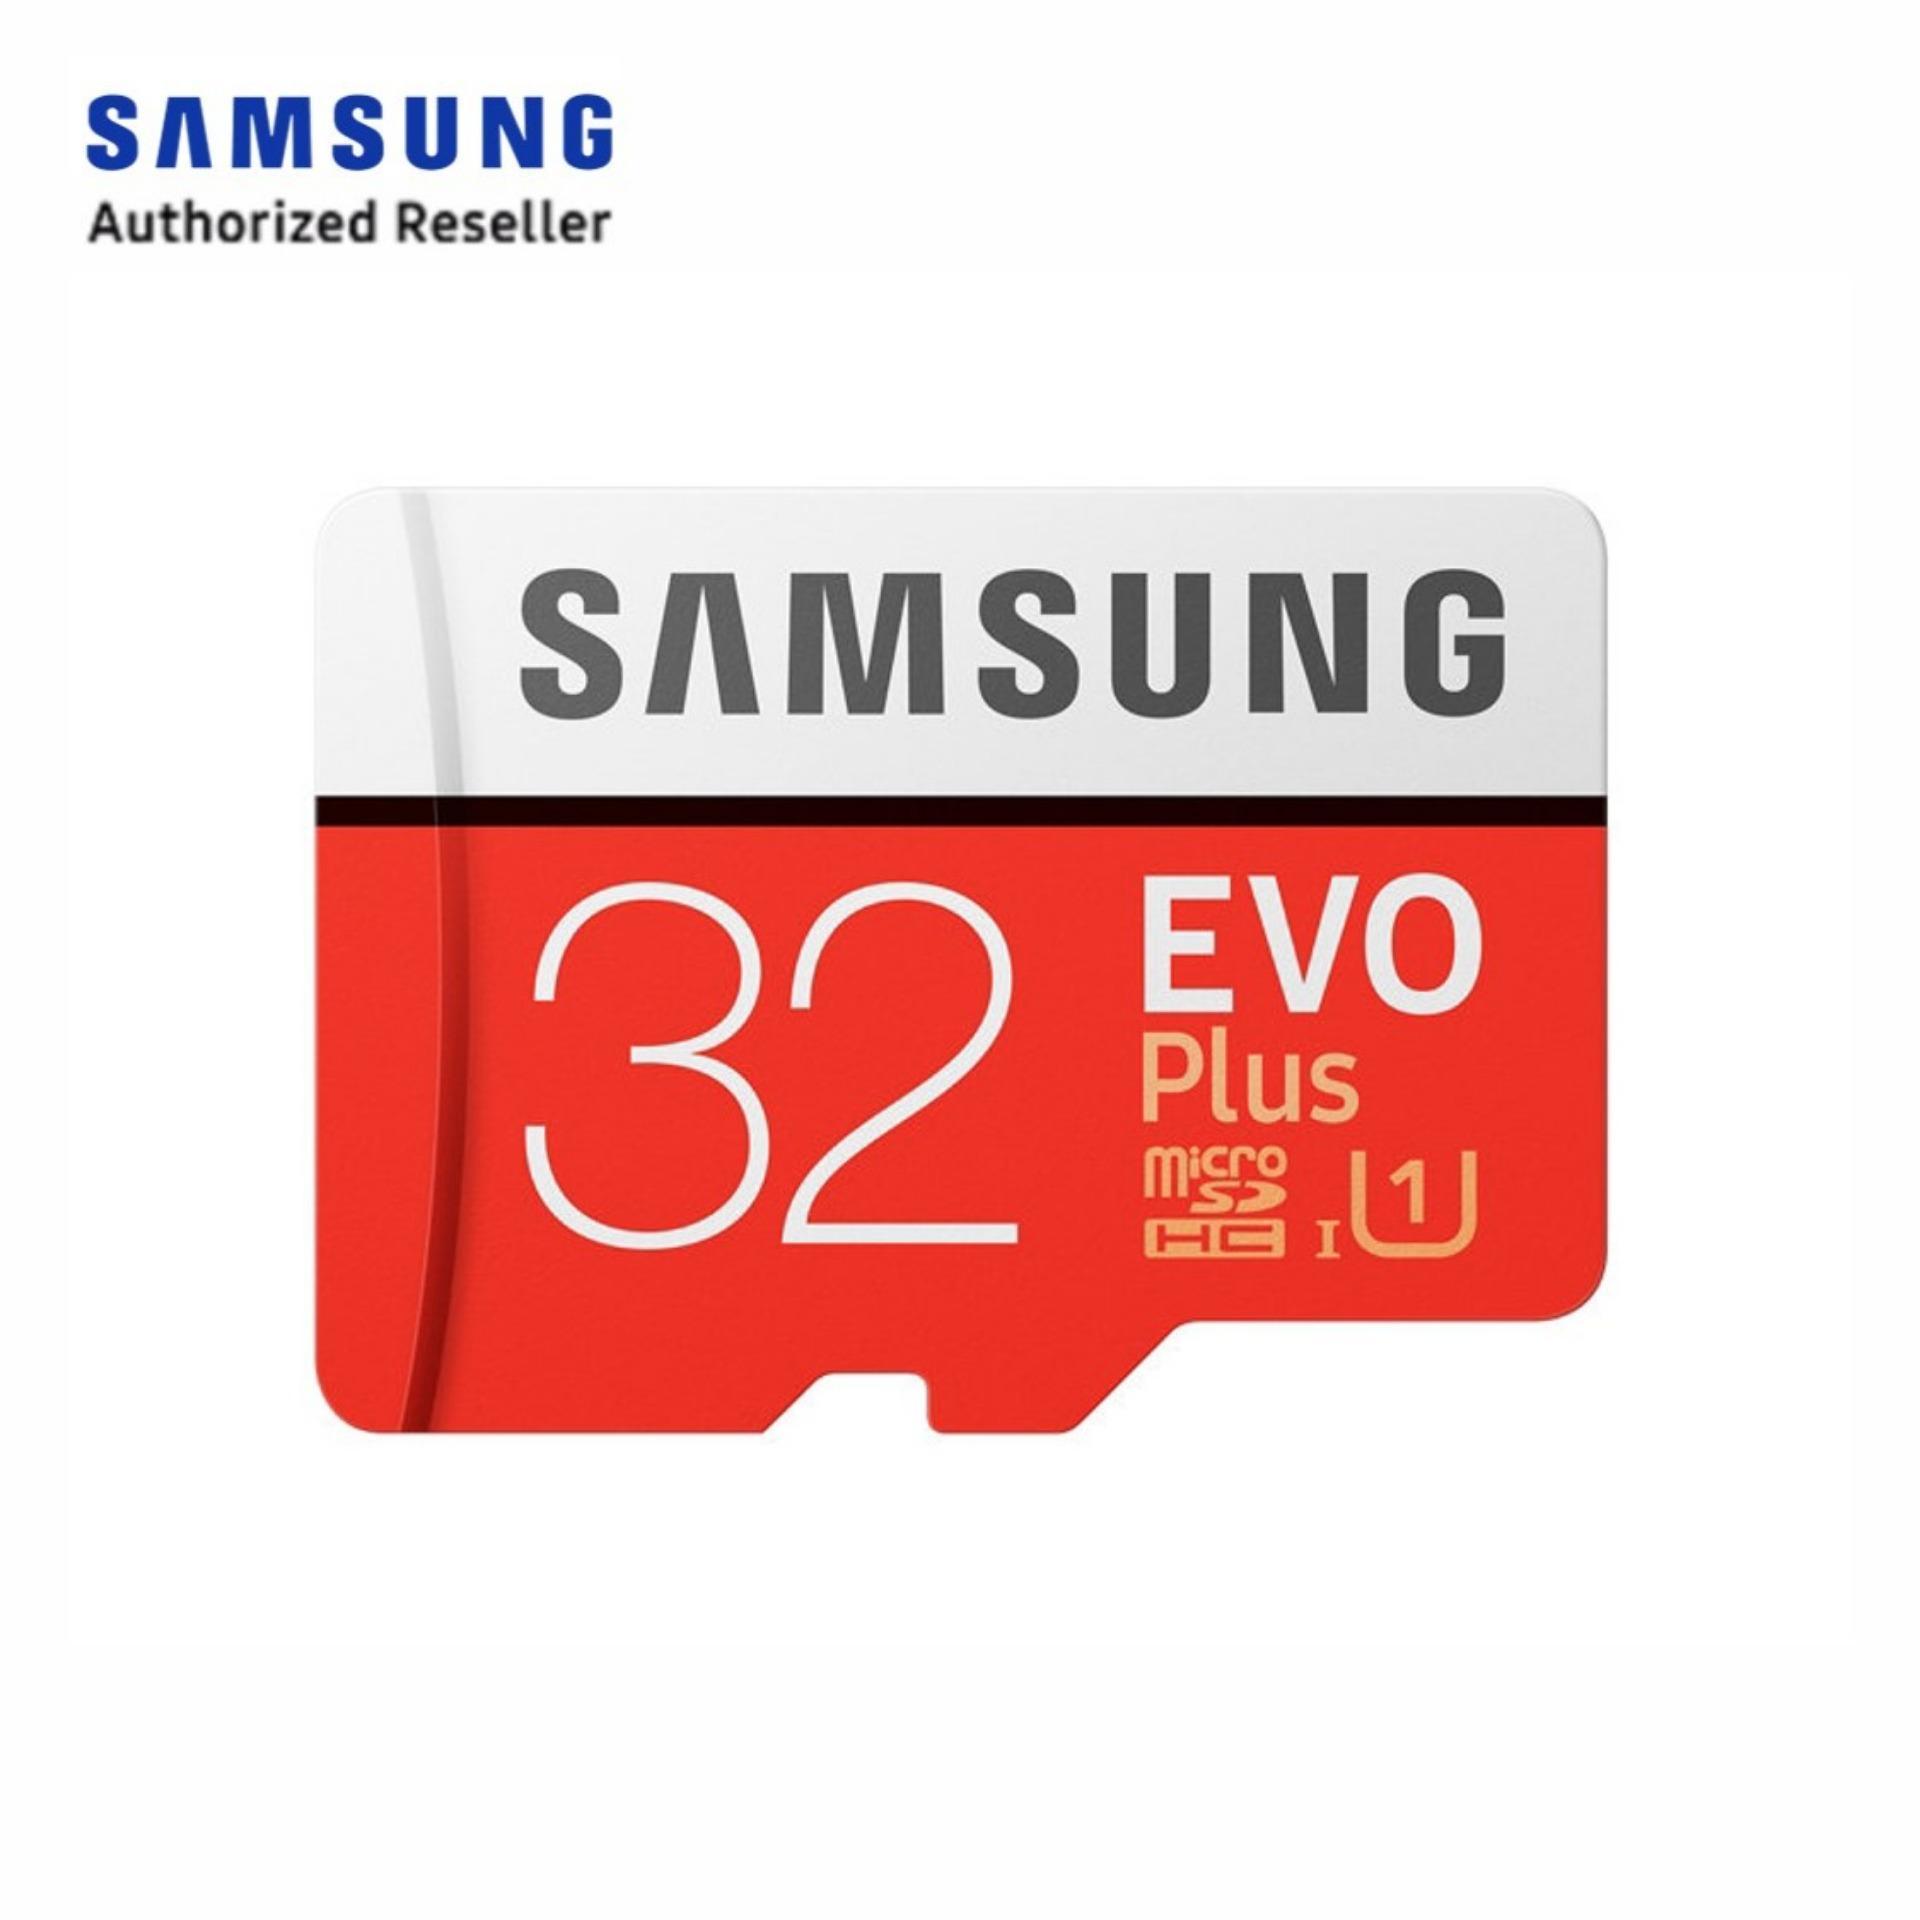 Compare Price Samsung 32Gb Evo Plus 2 Microsd 95 20Mbs W Apt On Singapore